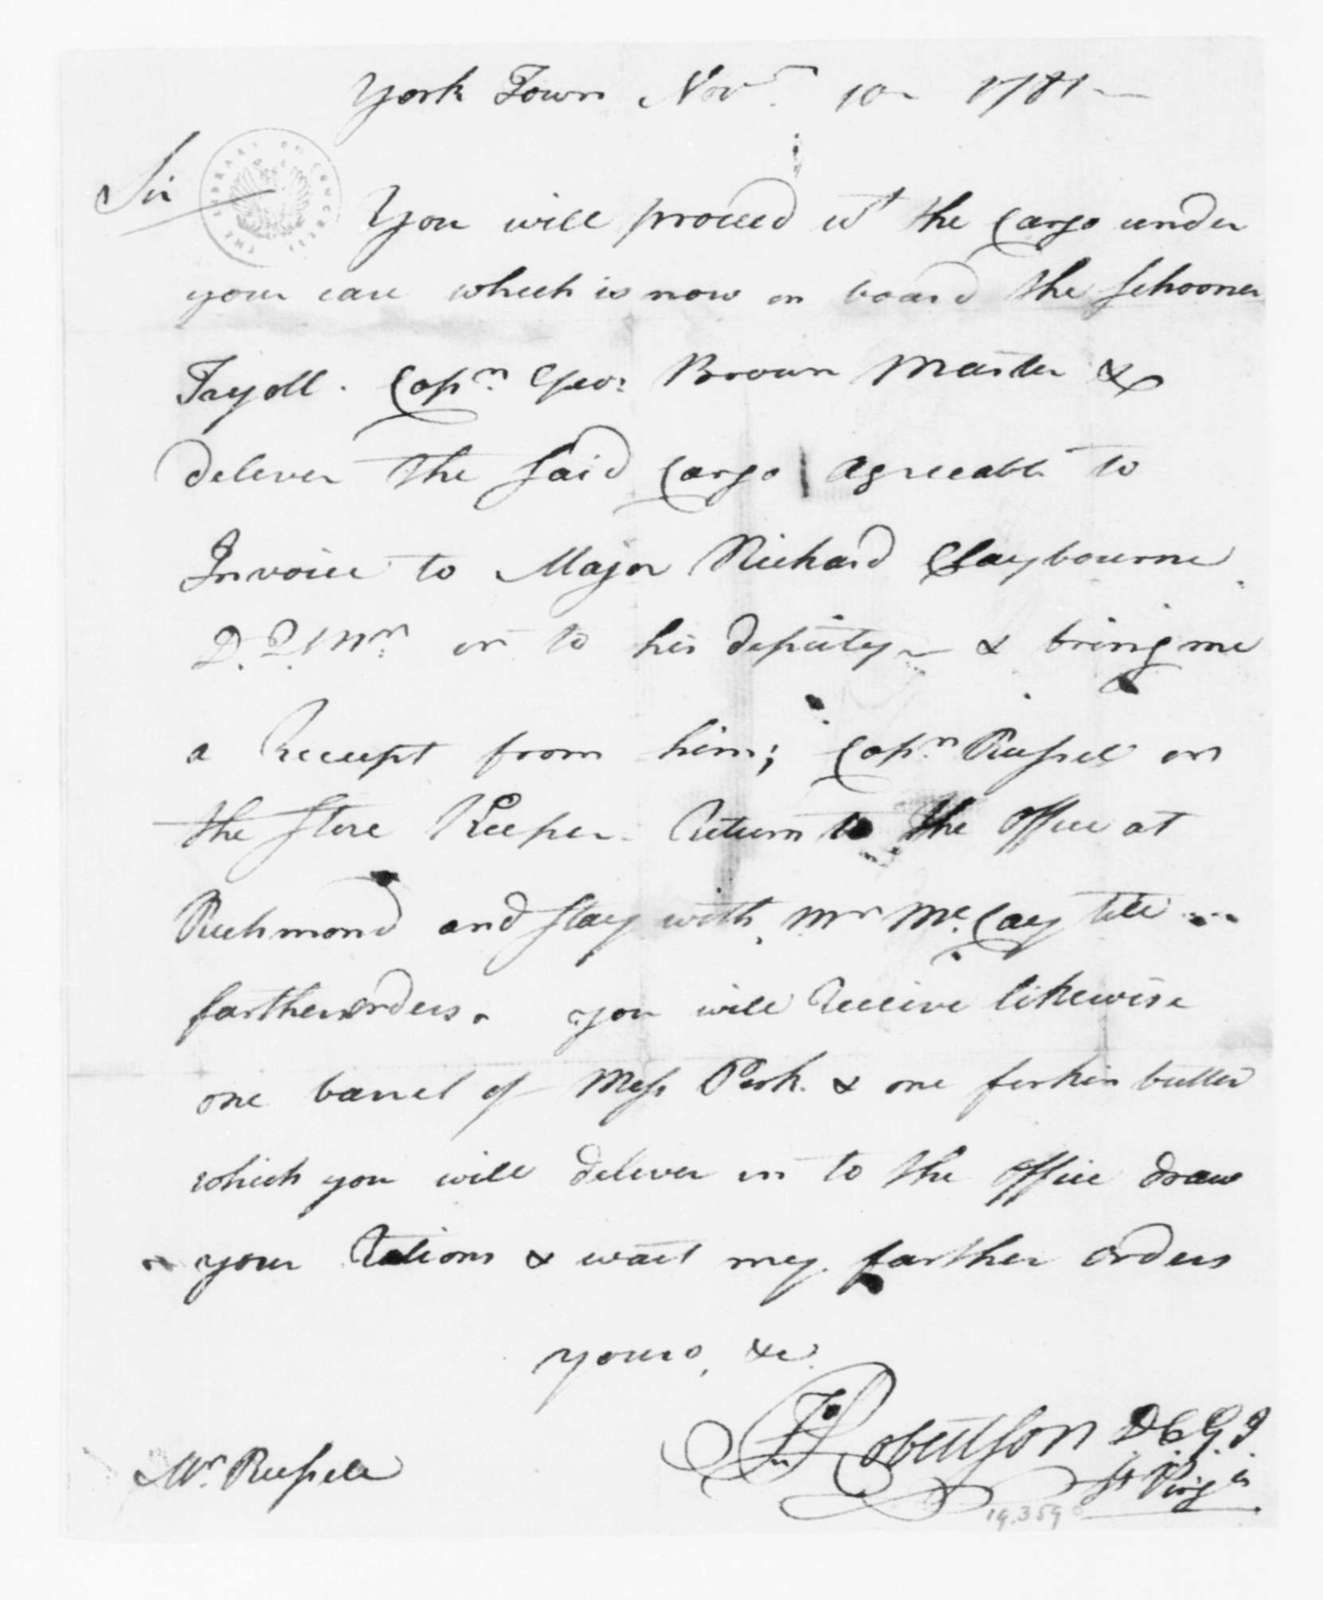 John Robertson to William Russelll, November 10, 1781.